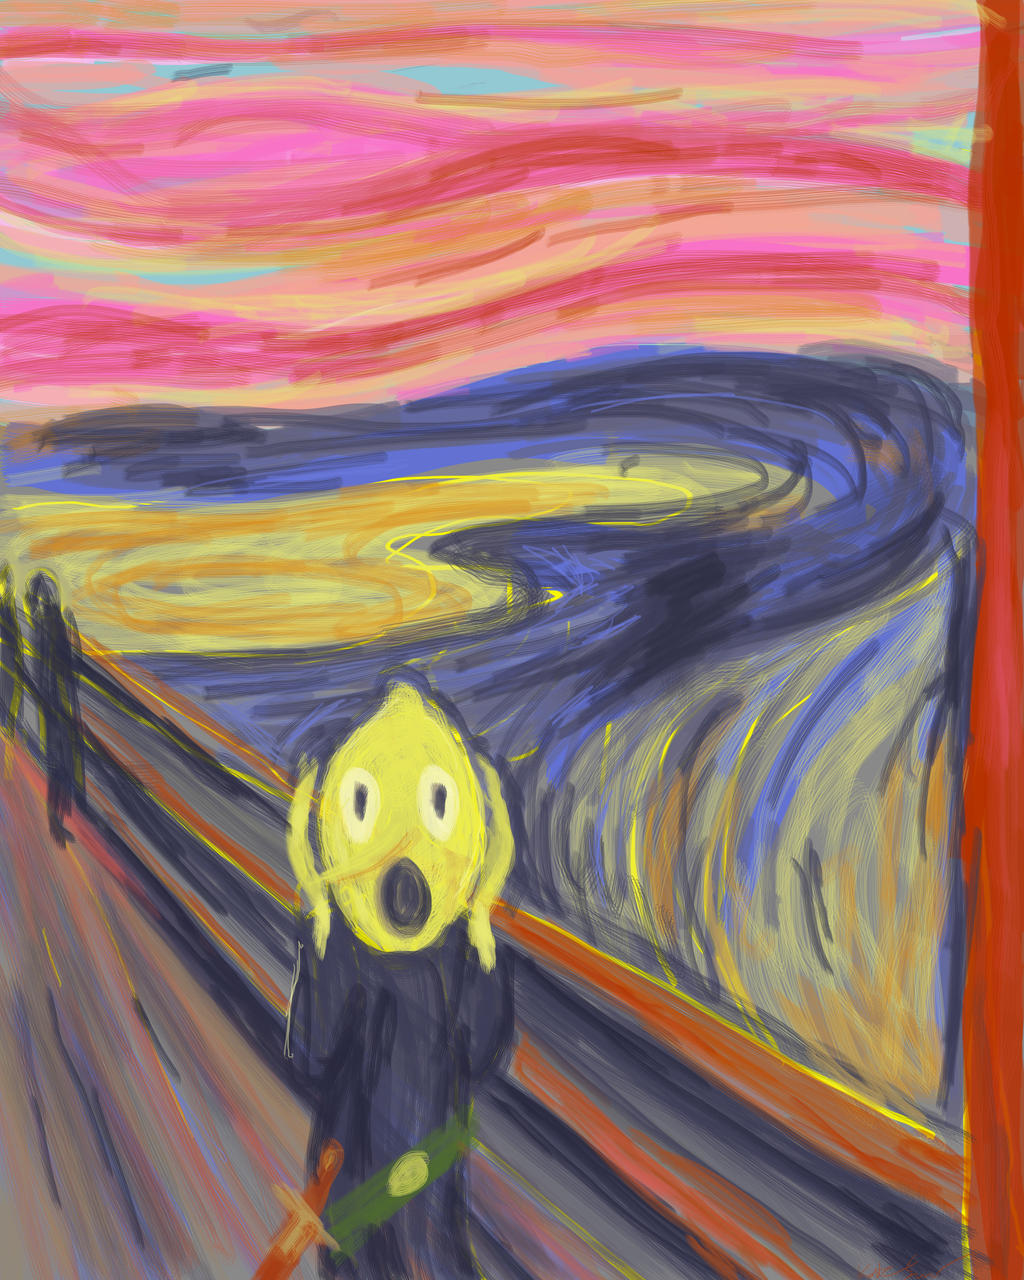 Lemongrab Scream by mossoak